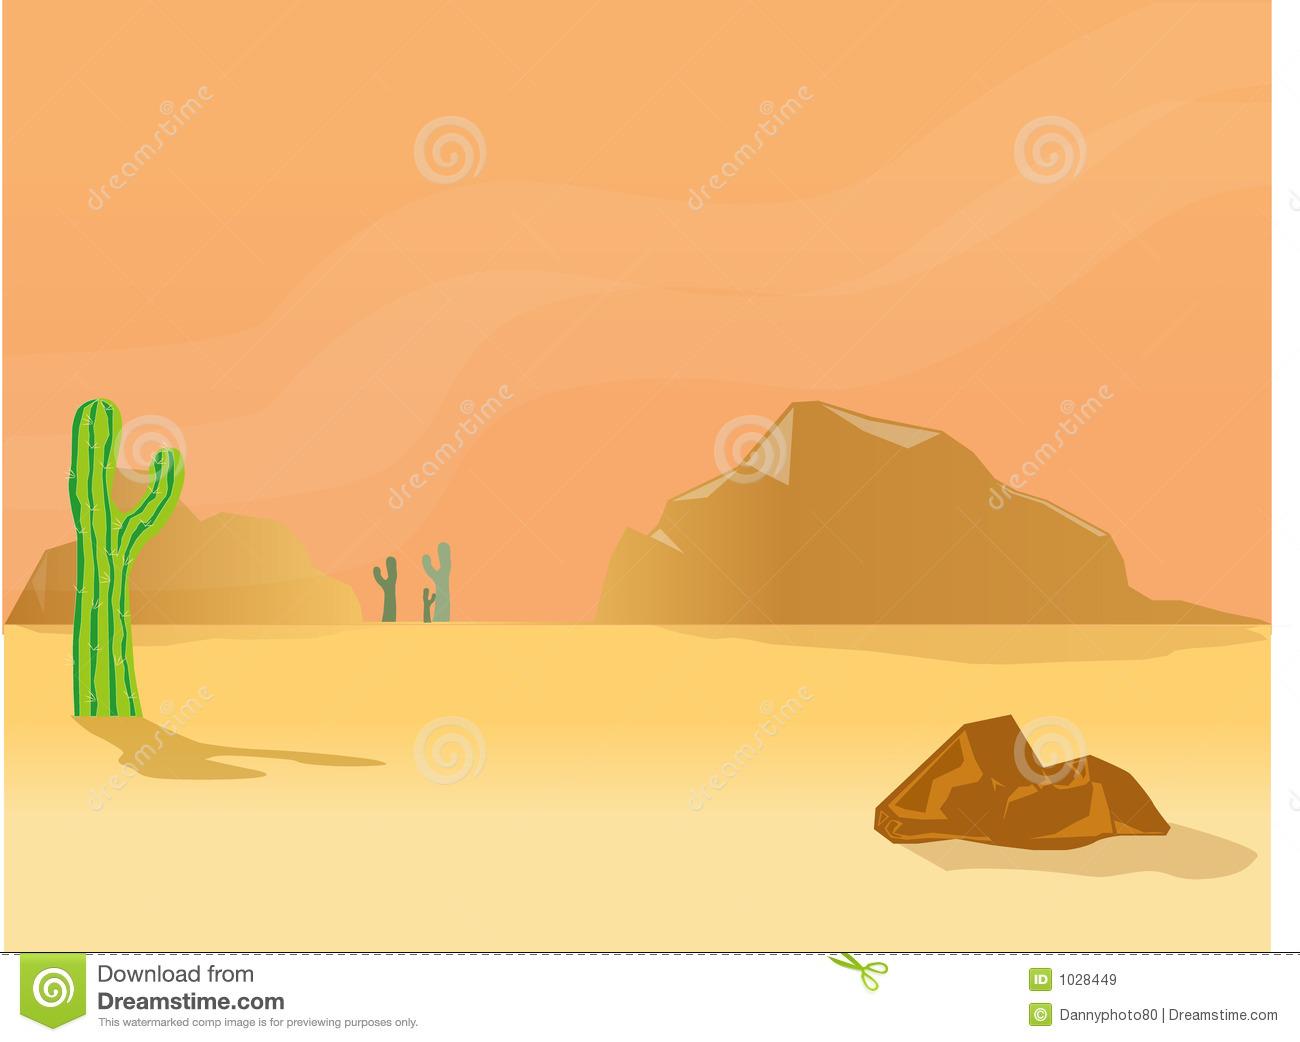 Desert Scenes Clipart - Clipart Kid